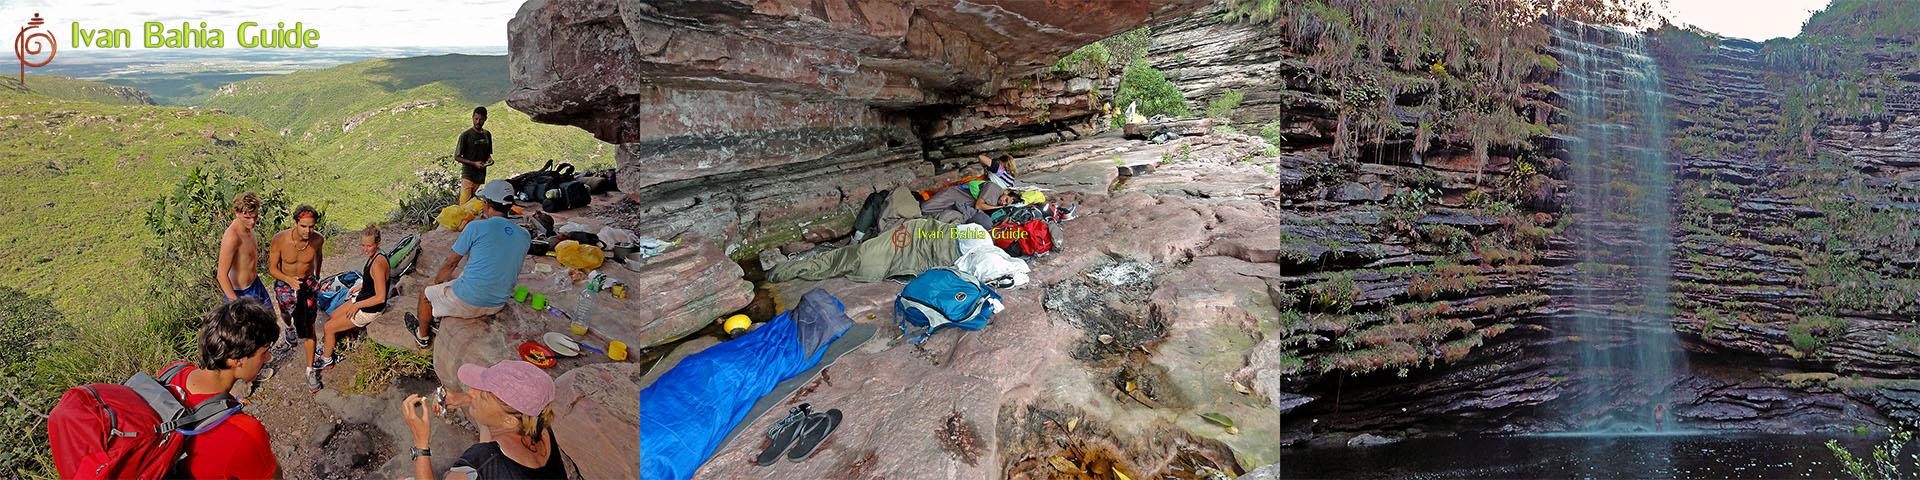 Ivan Bahia & Chapada Diamantina guide / les meilleurs trekkings a Chapada Diamantina Parc National (connu comme le 'Grand Canyon Brésilien') completement organisé pour vous, guide francophone possible / #ibtg #ibg #ivanbahiaguide #ivanbahiatravelguide #zenturturismo #ivanchapadadiamantinaguide #valedopati #patyvalley #pati #viapati #valecapao #ivanchapadaguide #chapadadiamantinatransfer #chapadatrekking #chapadaroots #chapadasoul #lencoisbahia #chapadadiamantinatrekking #ivanchapadadiamantinaguide  #chapadadiamantinaguide  #guidechapadadiamantina #lencois #lençois #chapadaadventuredaniel #diamondmountains #zentur # #guiachapadadiamantina #chapadaaventure #discoverchapada #chapadadiamond #chapadasoul #diamantinatrip  #tripadvisor #bahiametisse, #fernandobingre, #ivansalvadorbahia #salvadorbahiaTravel #toursbylocals #fotosbahia #bahiafotos #chapadadiamantinanationalpark #yourtoursbrazil #maurotours #bahiatopturismo #bahiapremium #maisbahiaturismo #fernandobingretourguide #cassiturismo